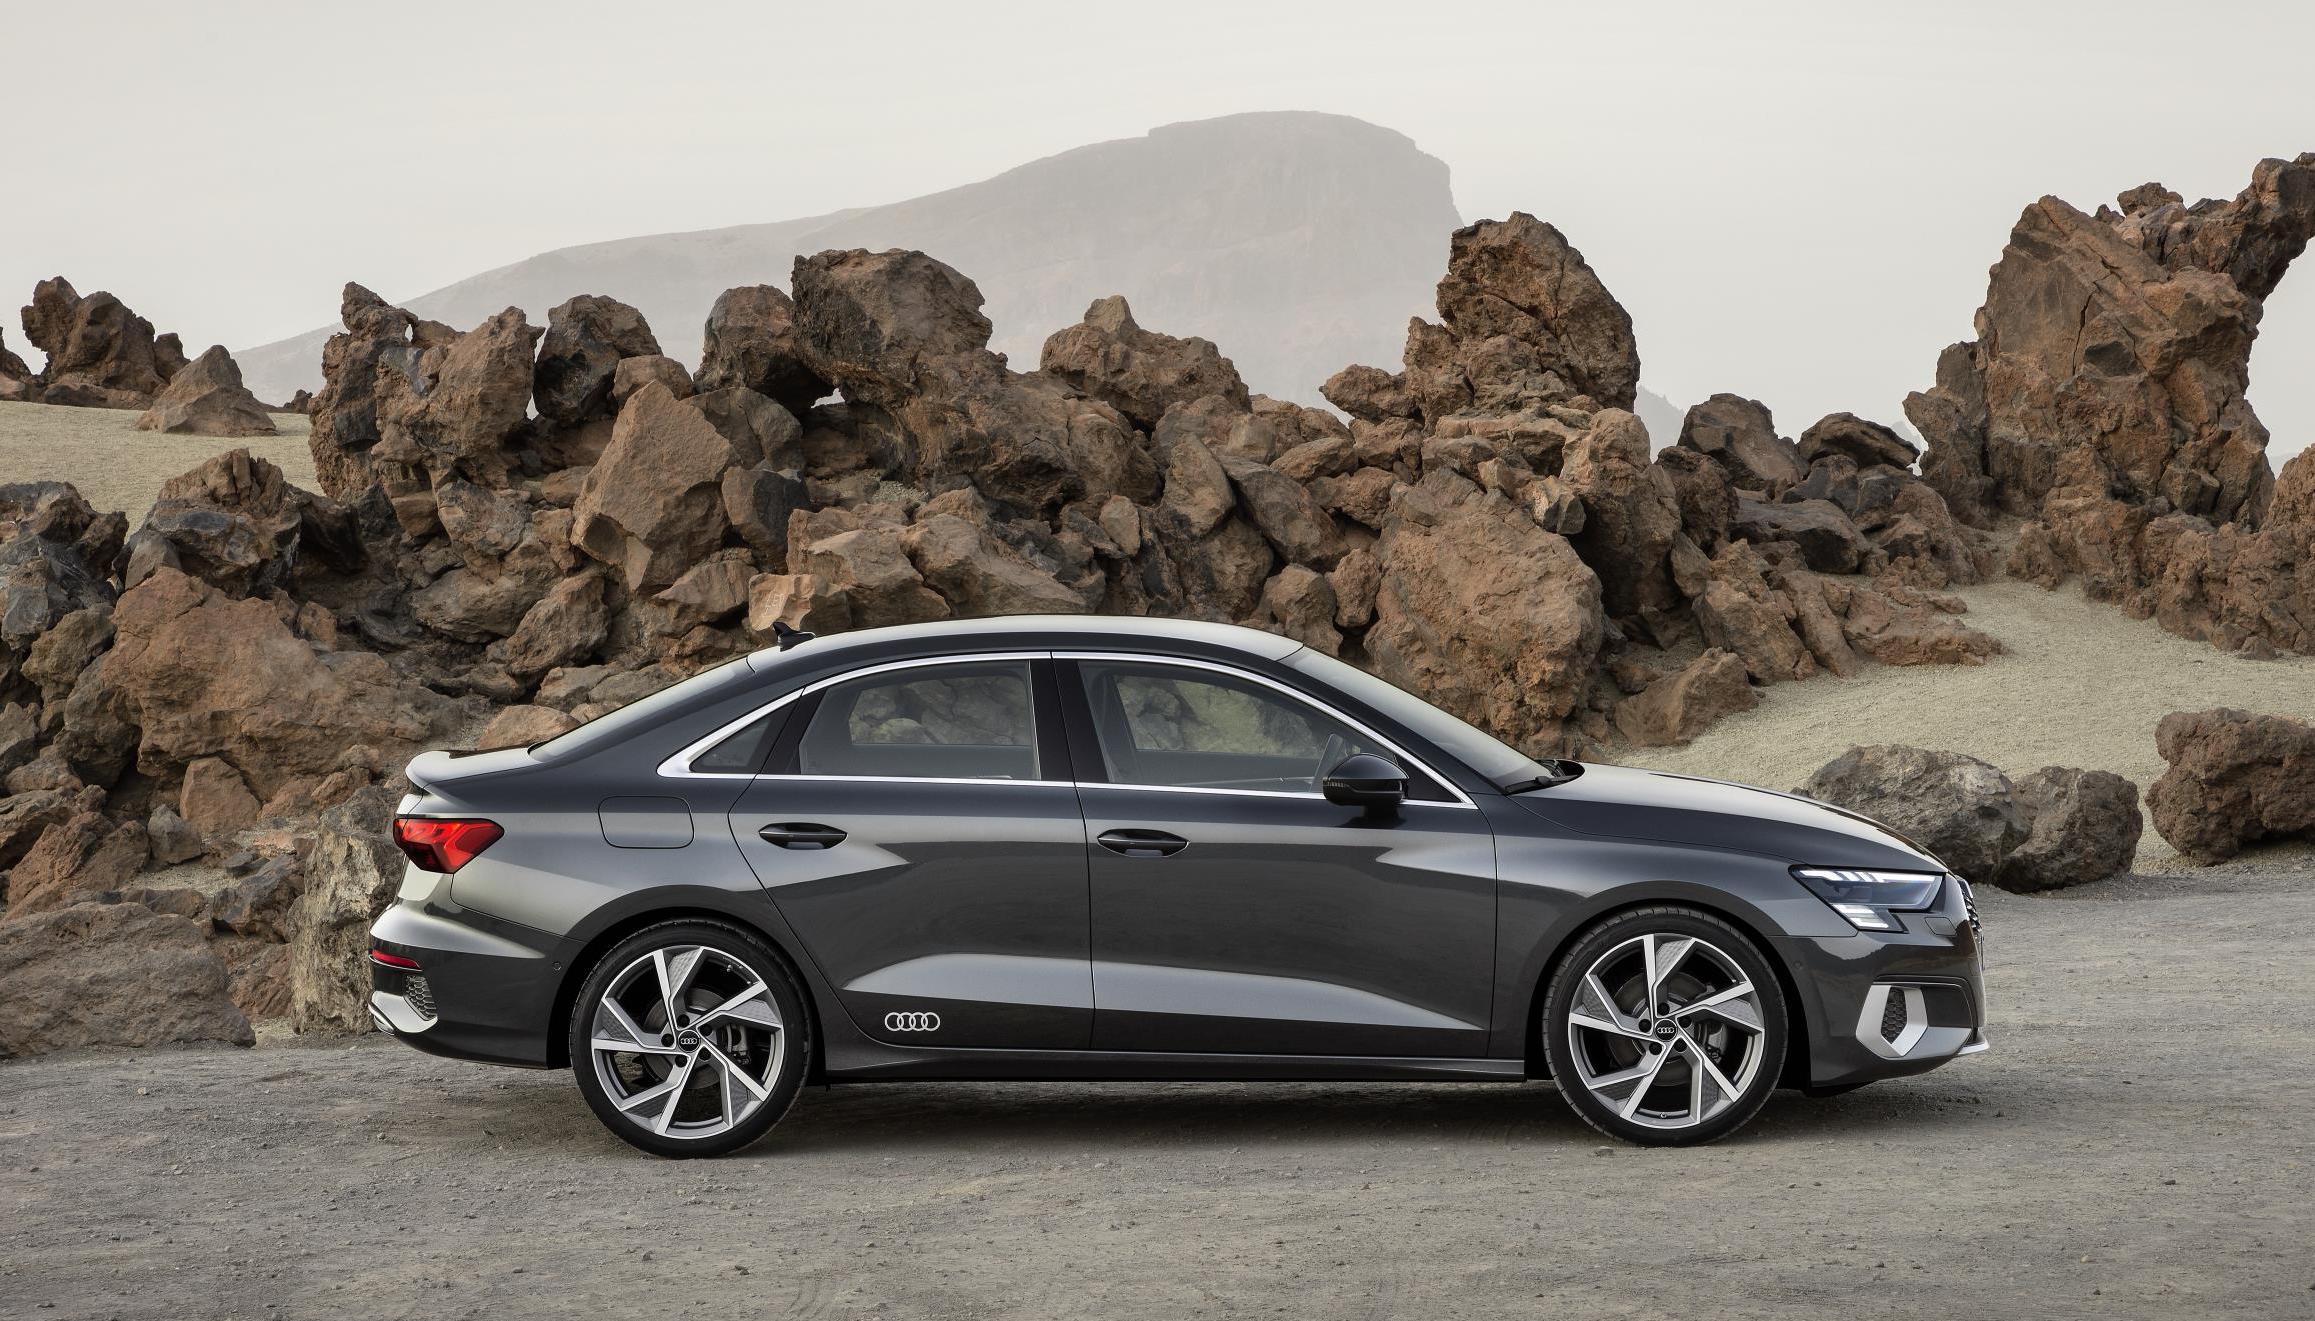 2021 Audi A3 Sedan revealed, looks as stunning as ever ...